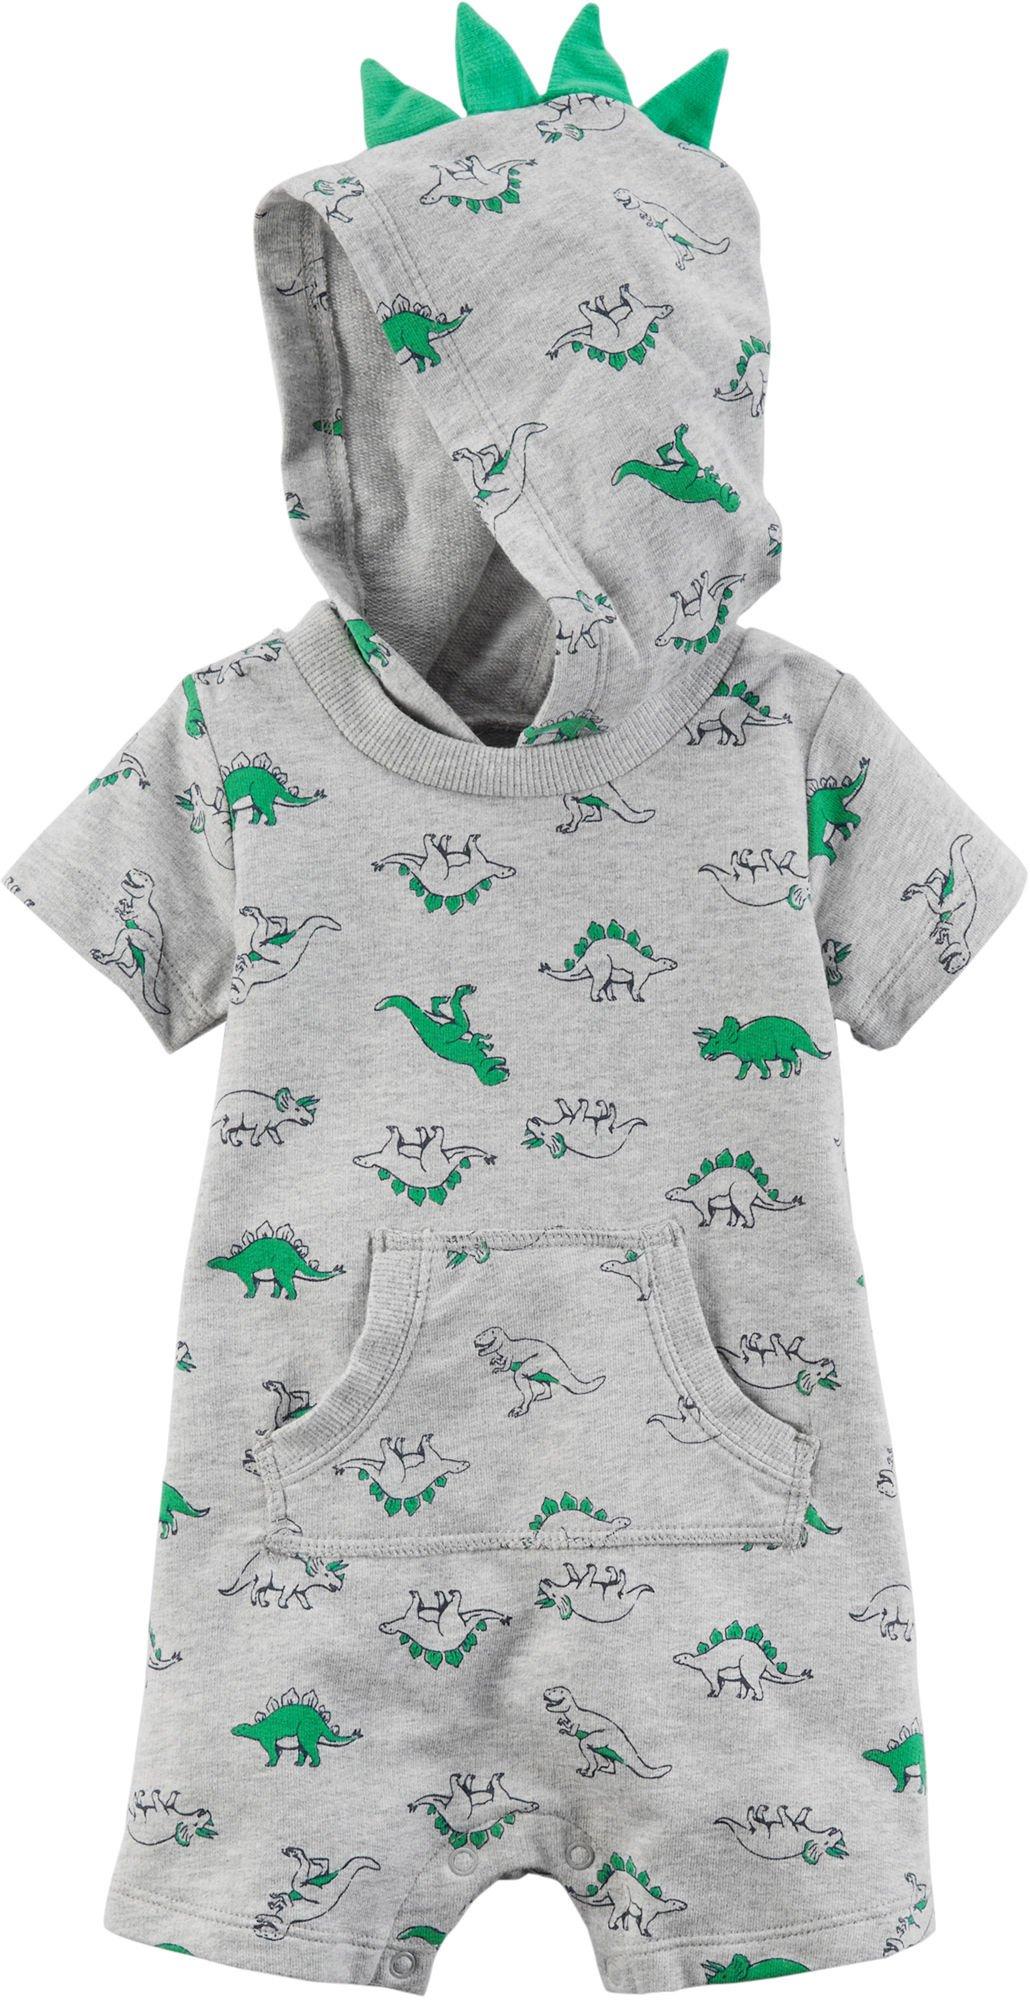 Carter's Baby Boys' Short Sleeve Dino Print Hooded Romper 6 Months